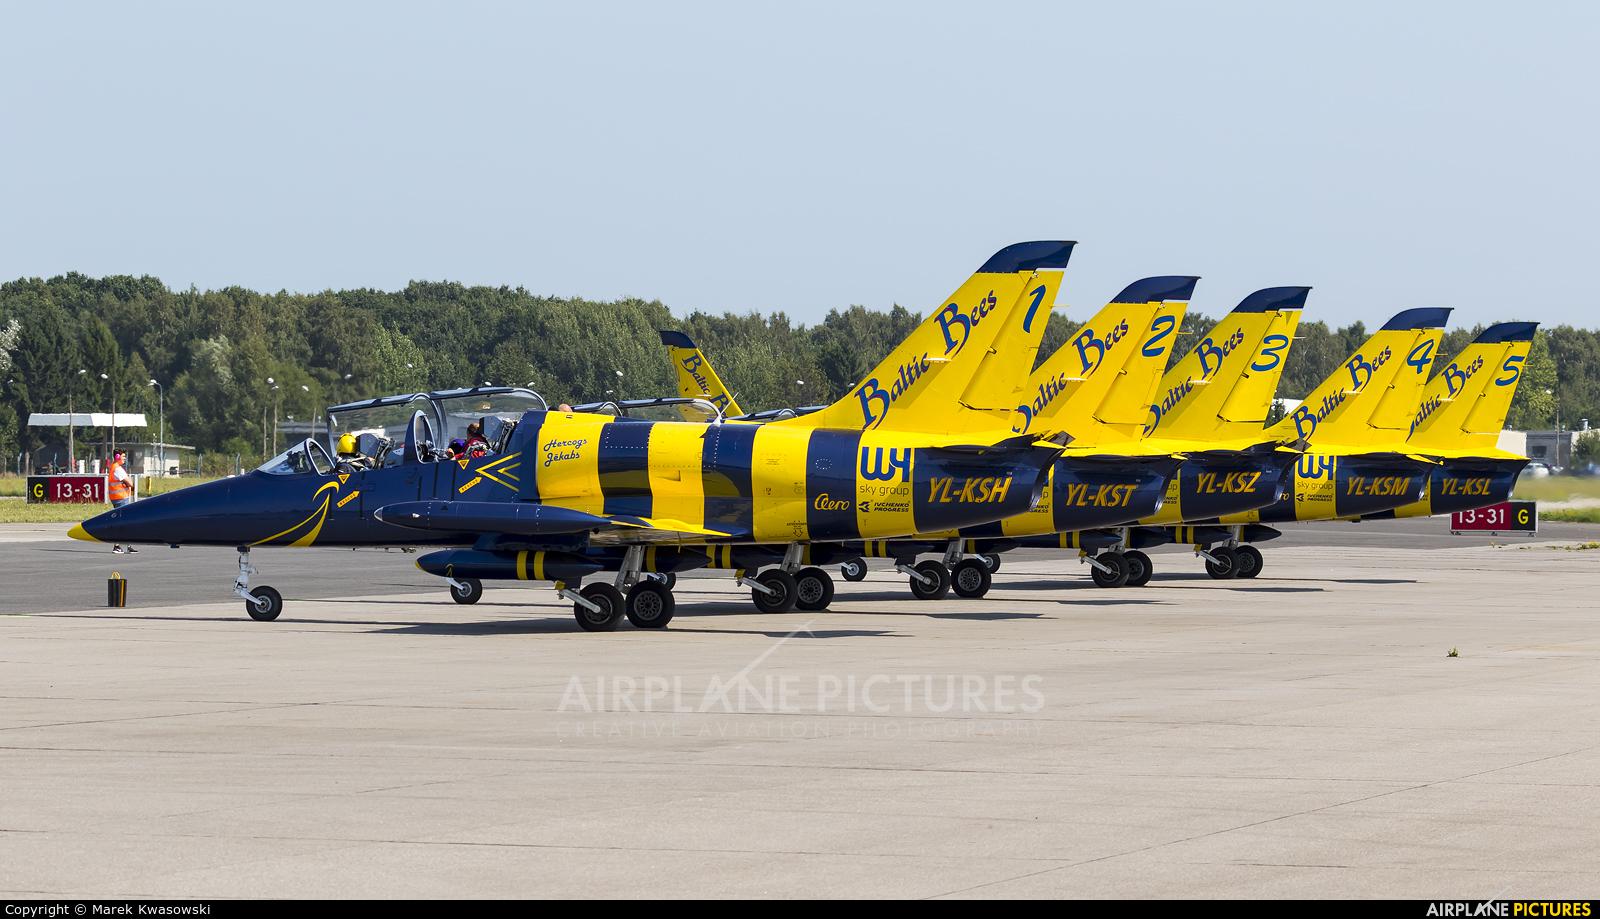 Baltic Bees Jet Team YL-KSH aircraft at Gdynia- Babie Doły (Oksywie)